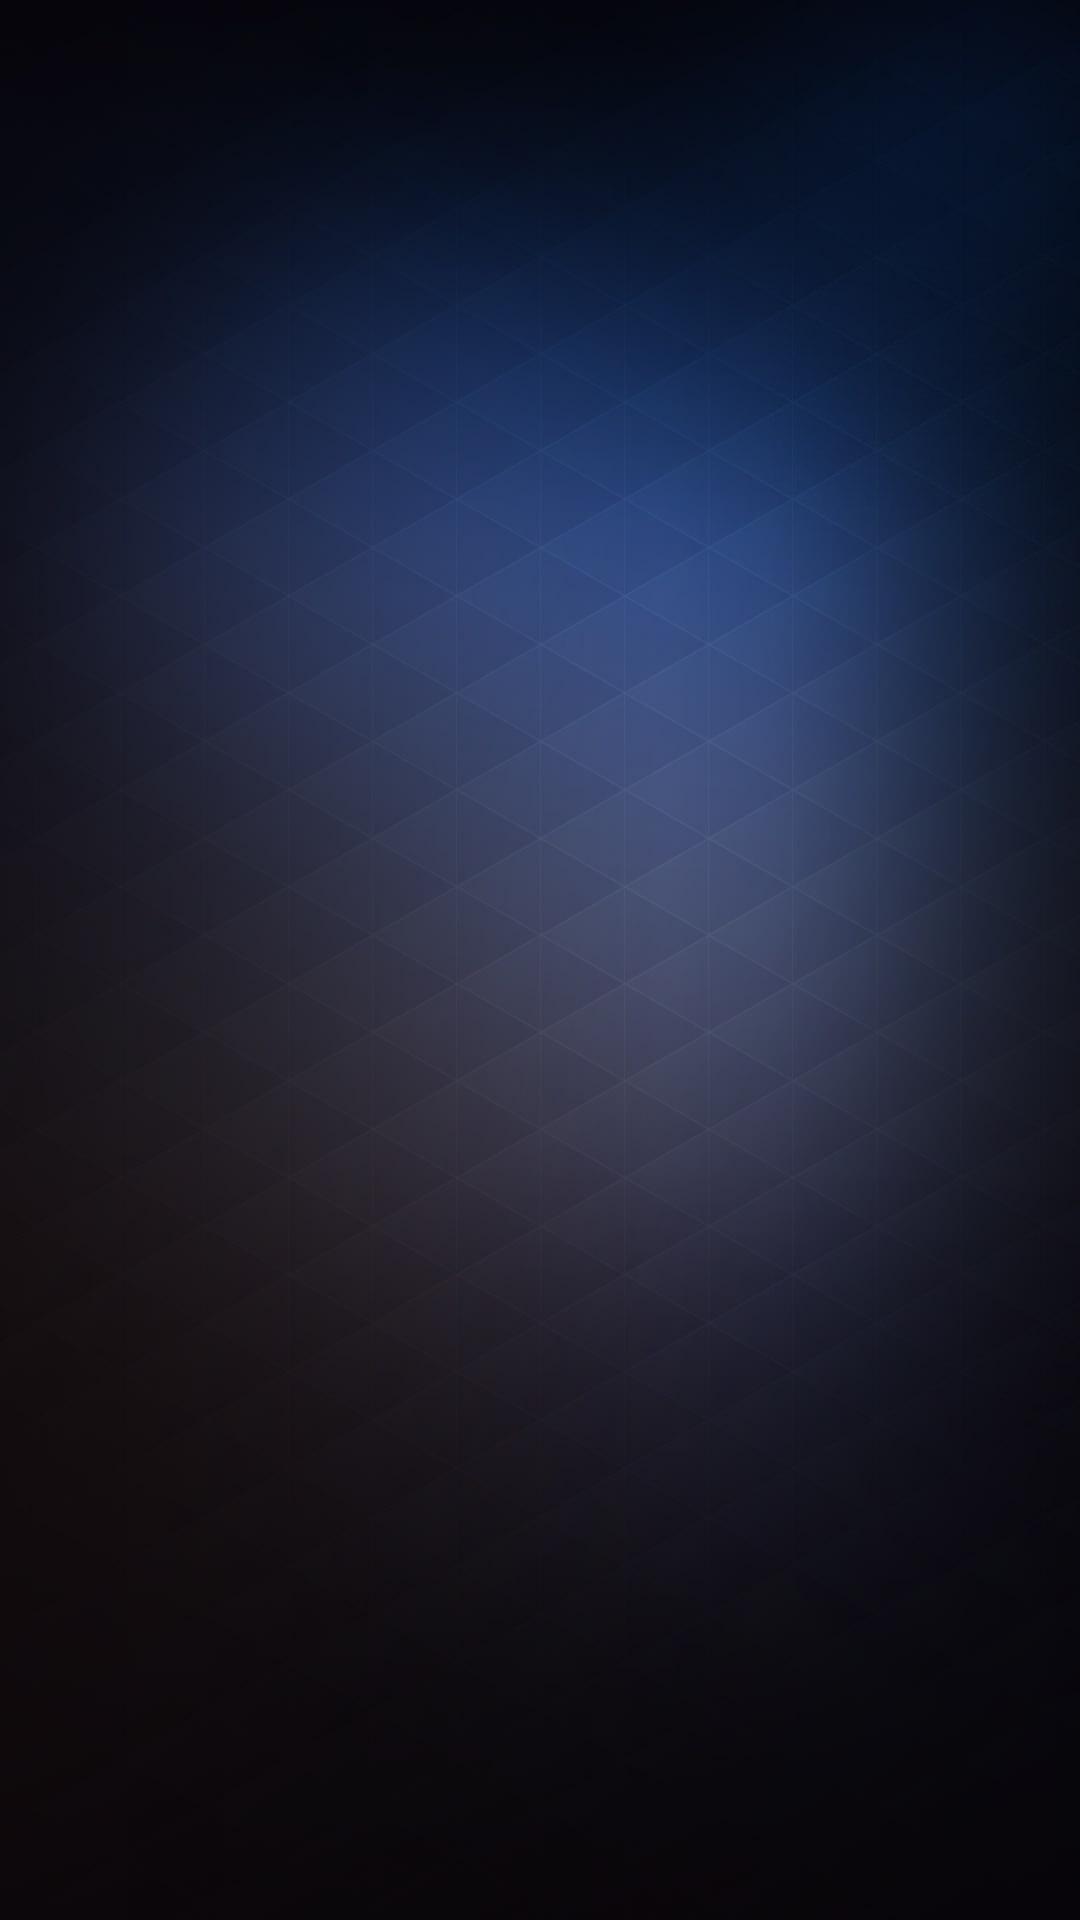 Best Wallpaper App For Iphone Download Huawei P8 Stock Wallpapers